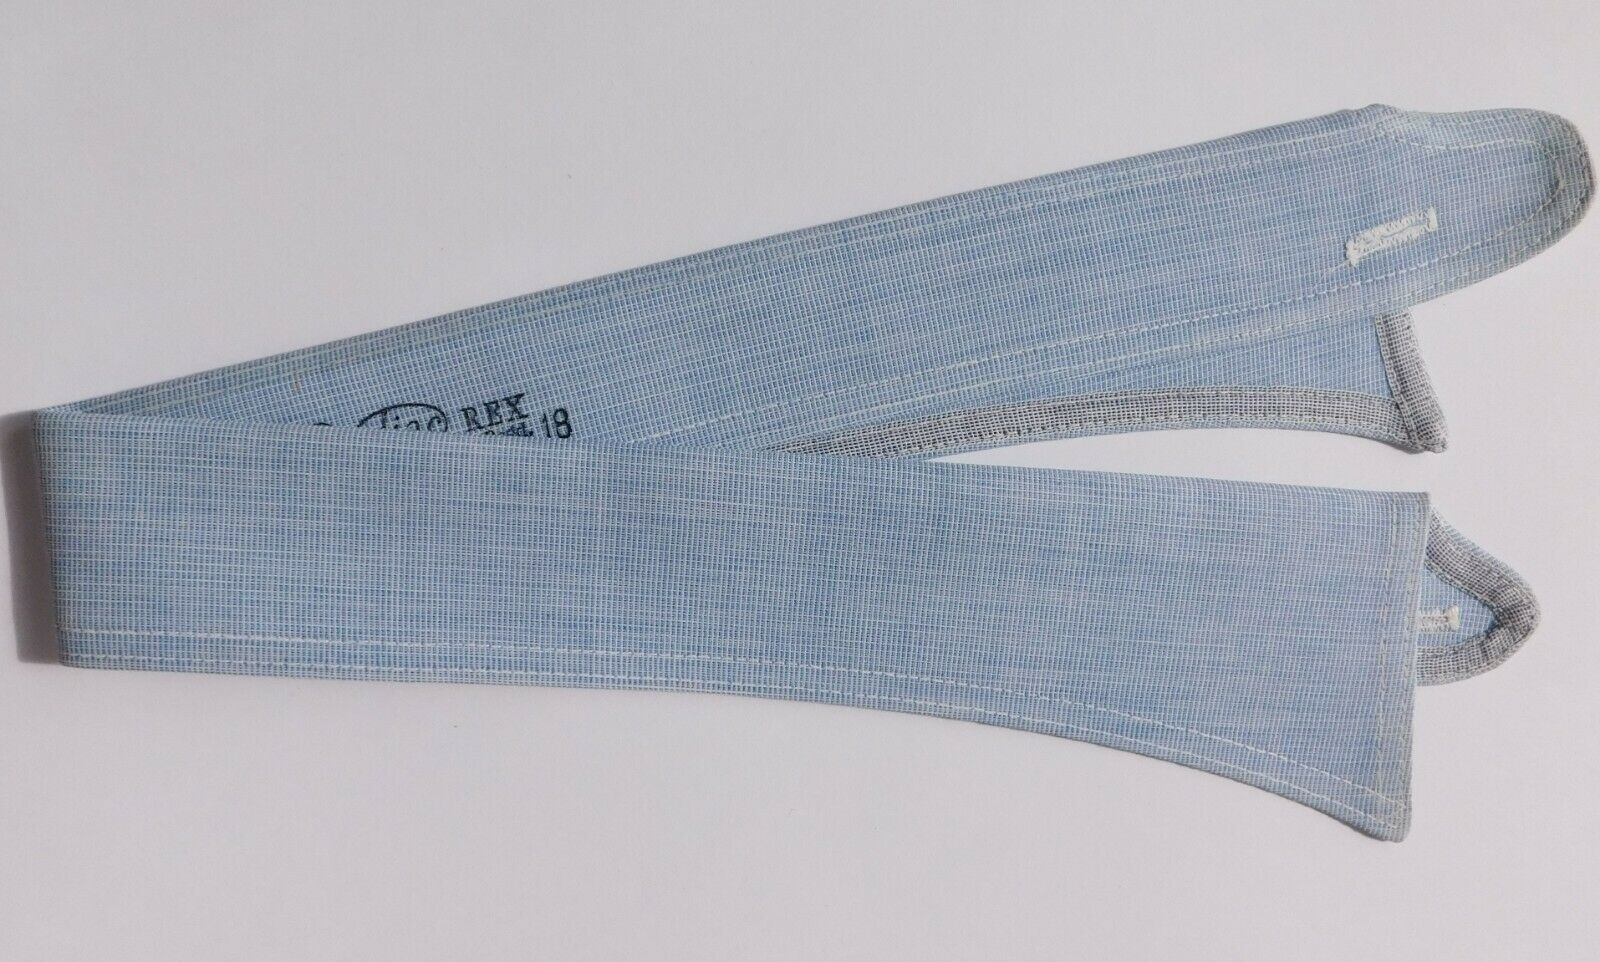 Radiac Rex shirt collar size 18 RAF blue semi-stiff UNUSED vintage detachable